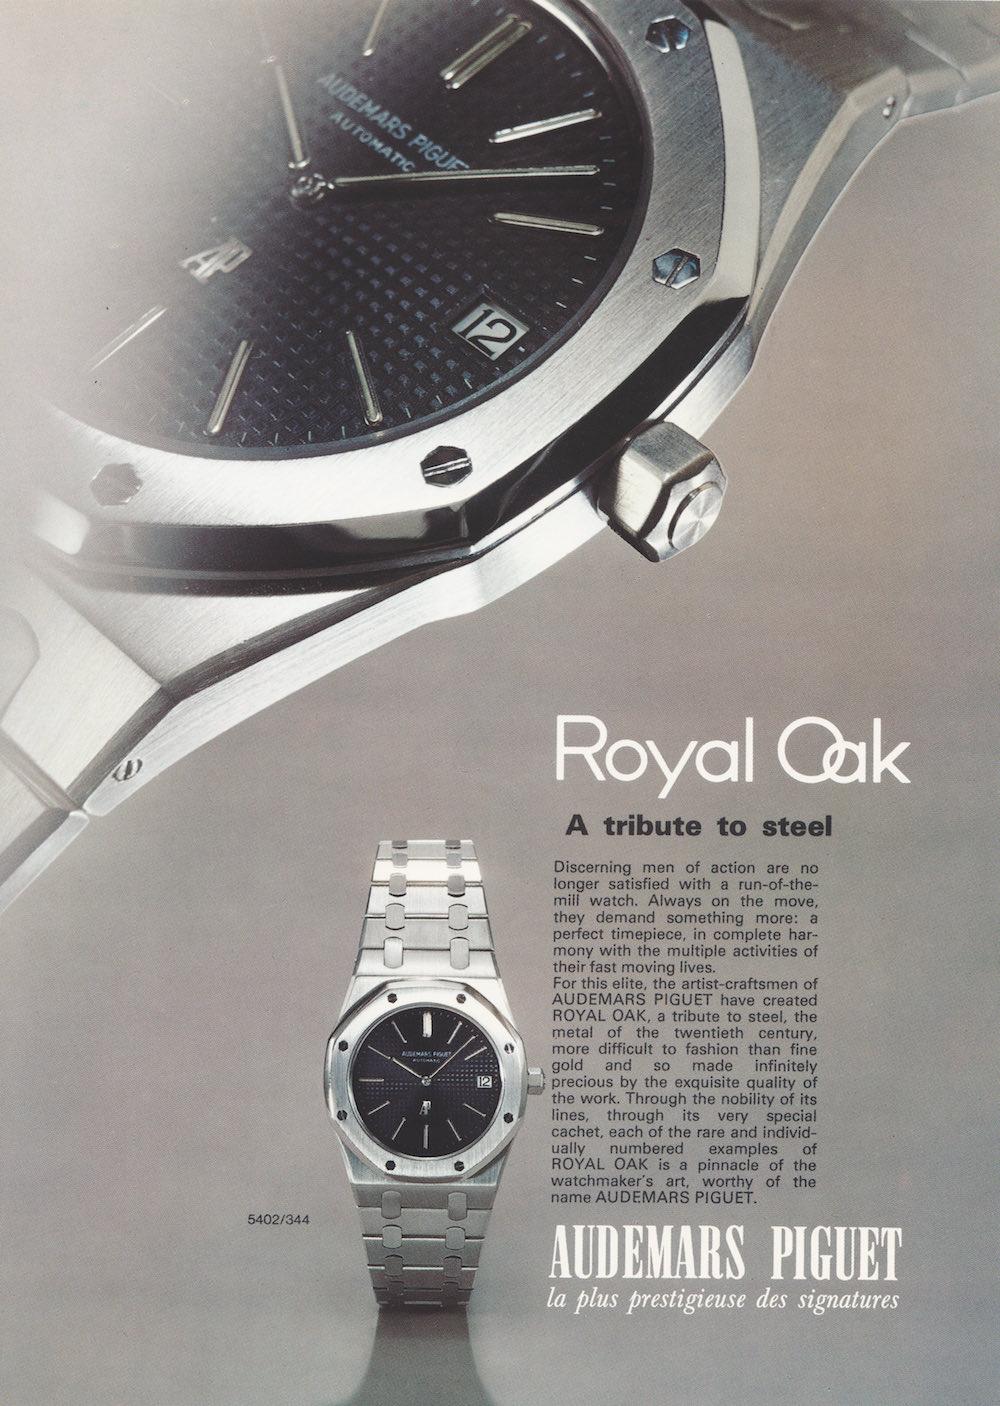 audemars-piguet-royal-oak-1972-oltonyora-karora-svajciora-luxusora-orasblog-hirdetes_copy.jpg